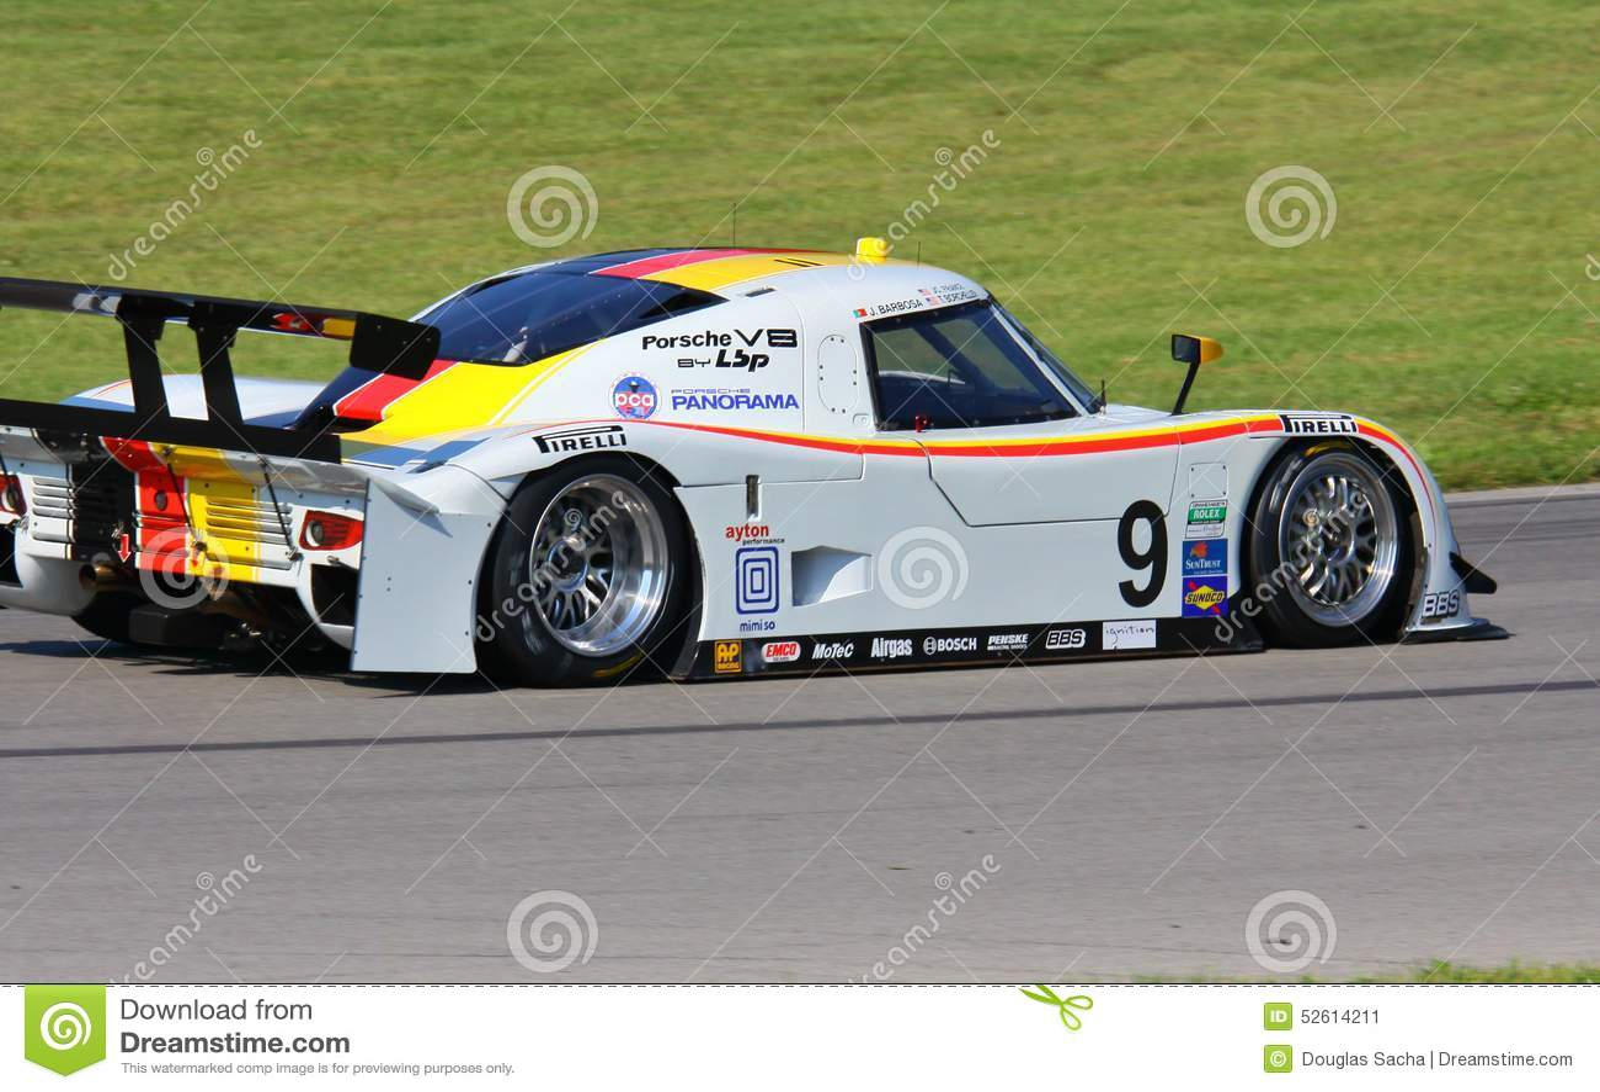 Joao Barbosa Races The Porsche Editorial Photo - Image of